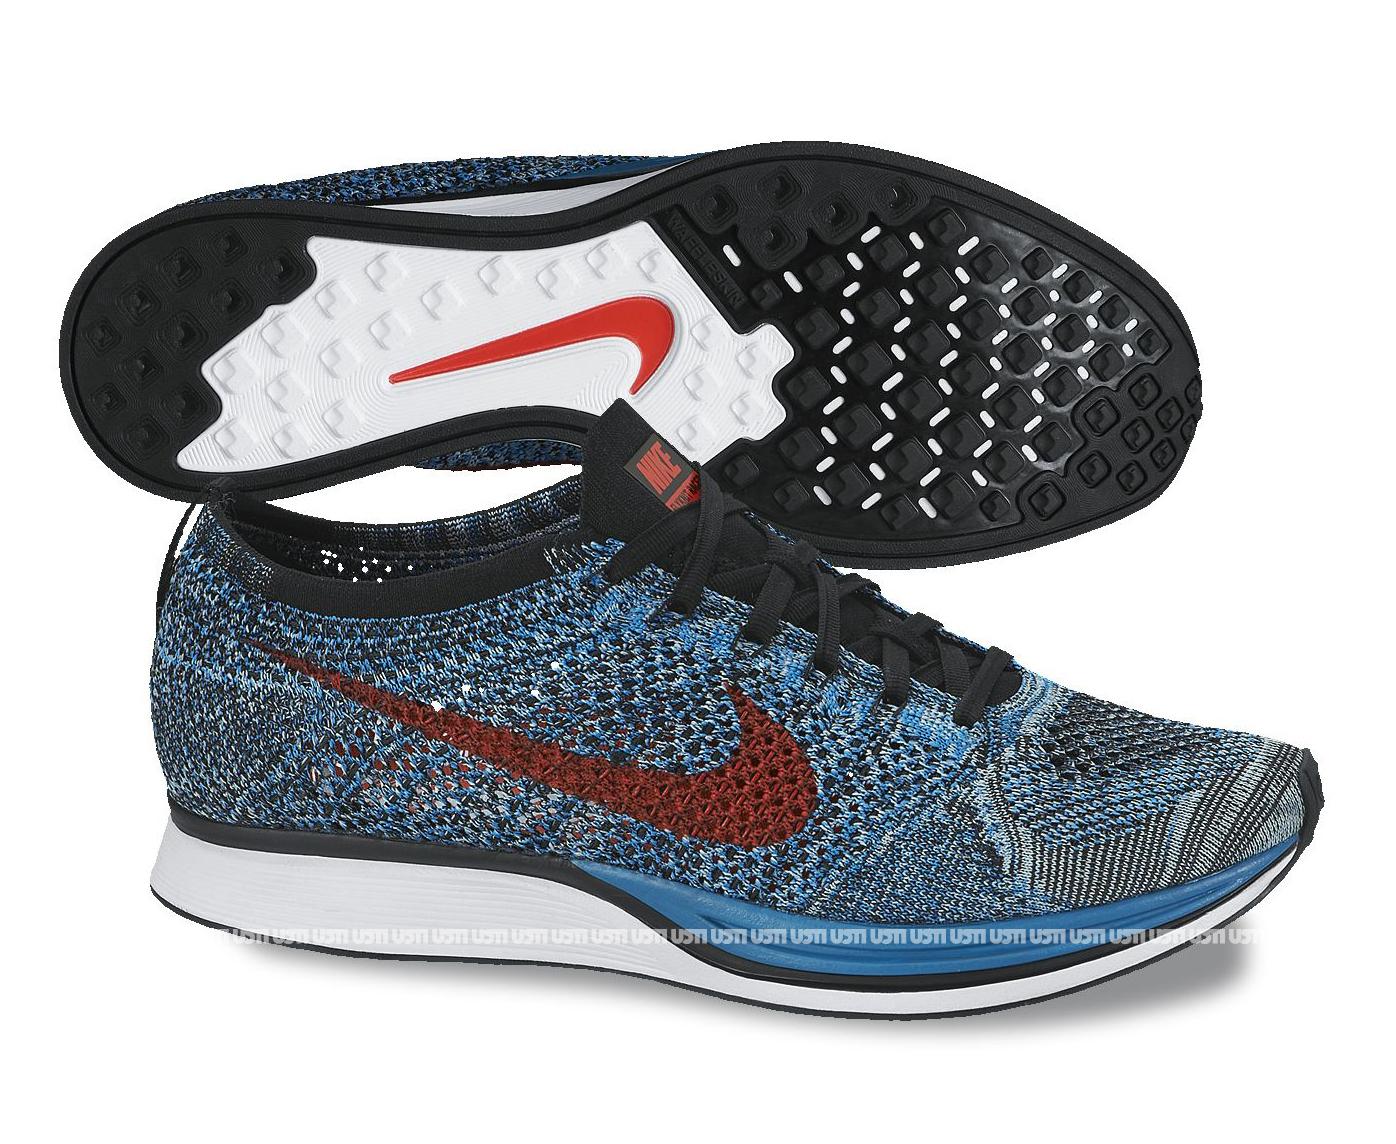 sports shoes 82a67 17b37 ebff5z1g09qzjigihulb.jpg